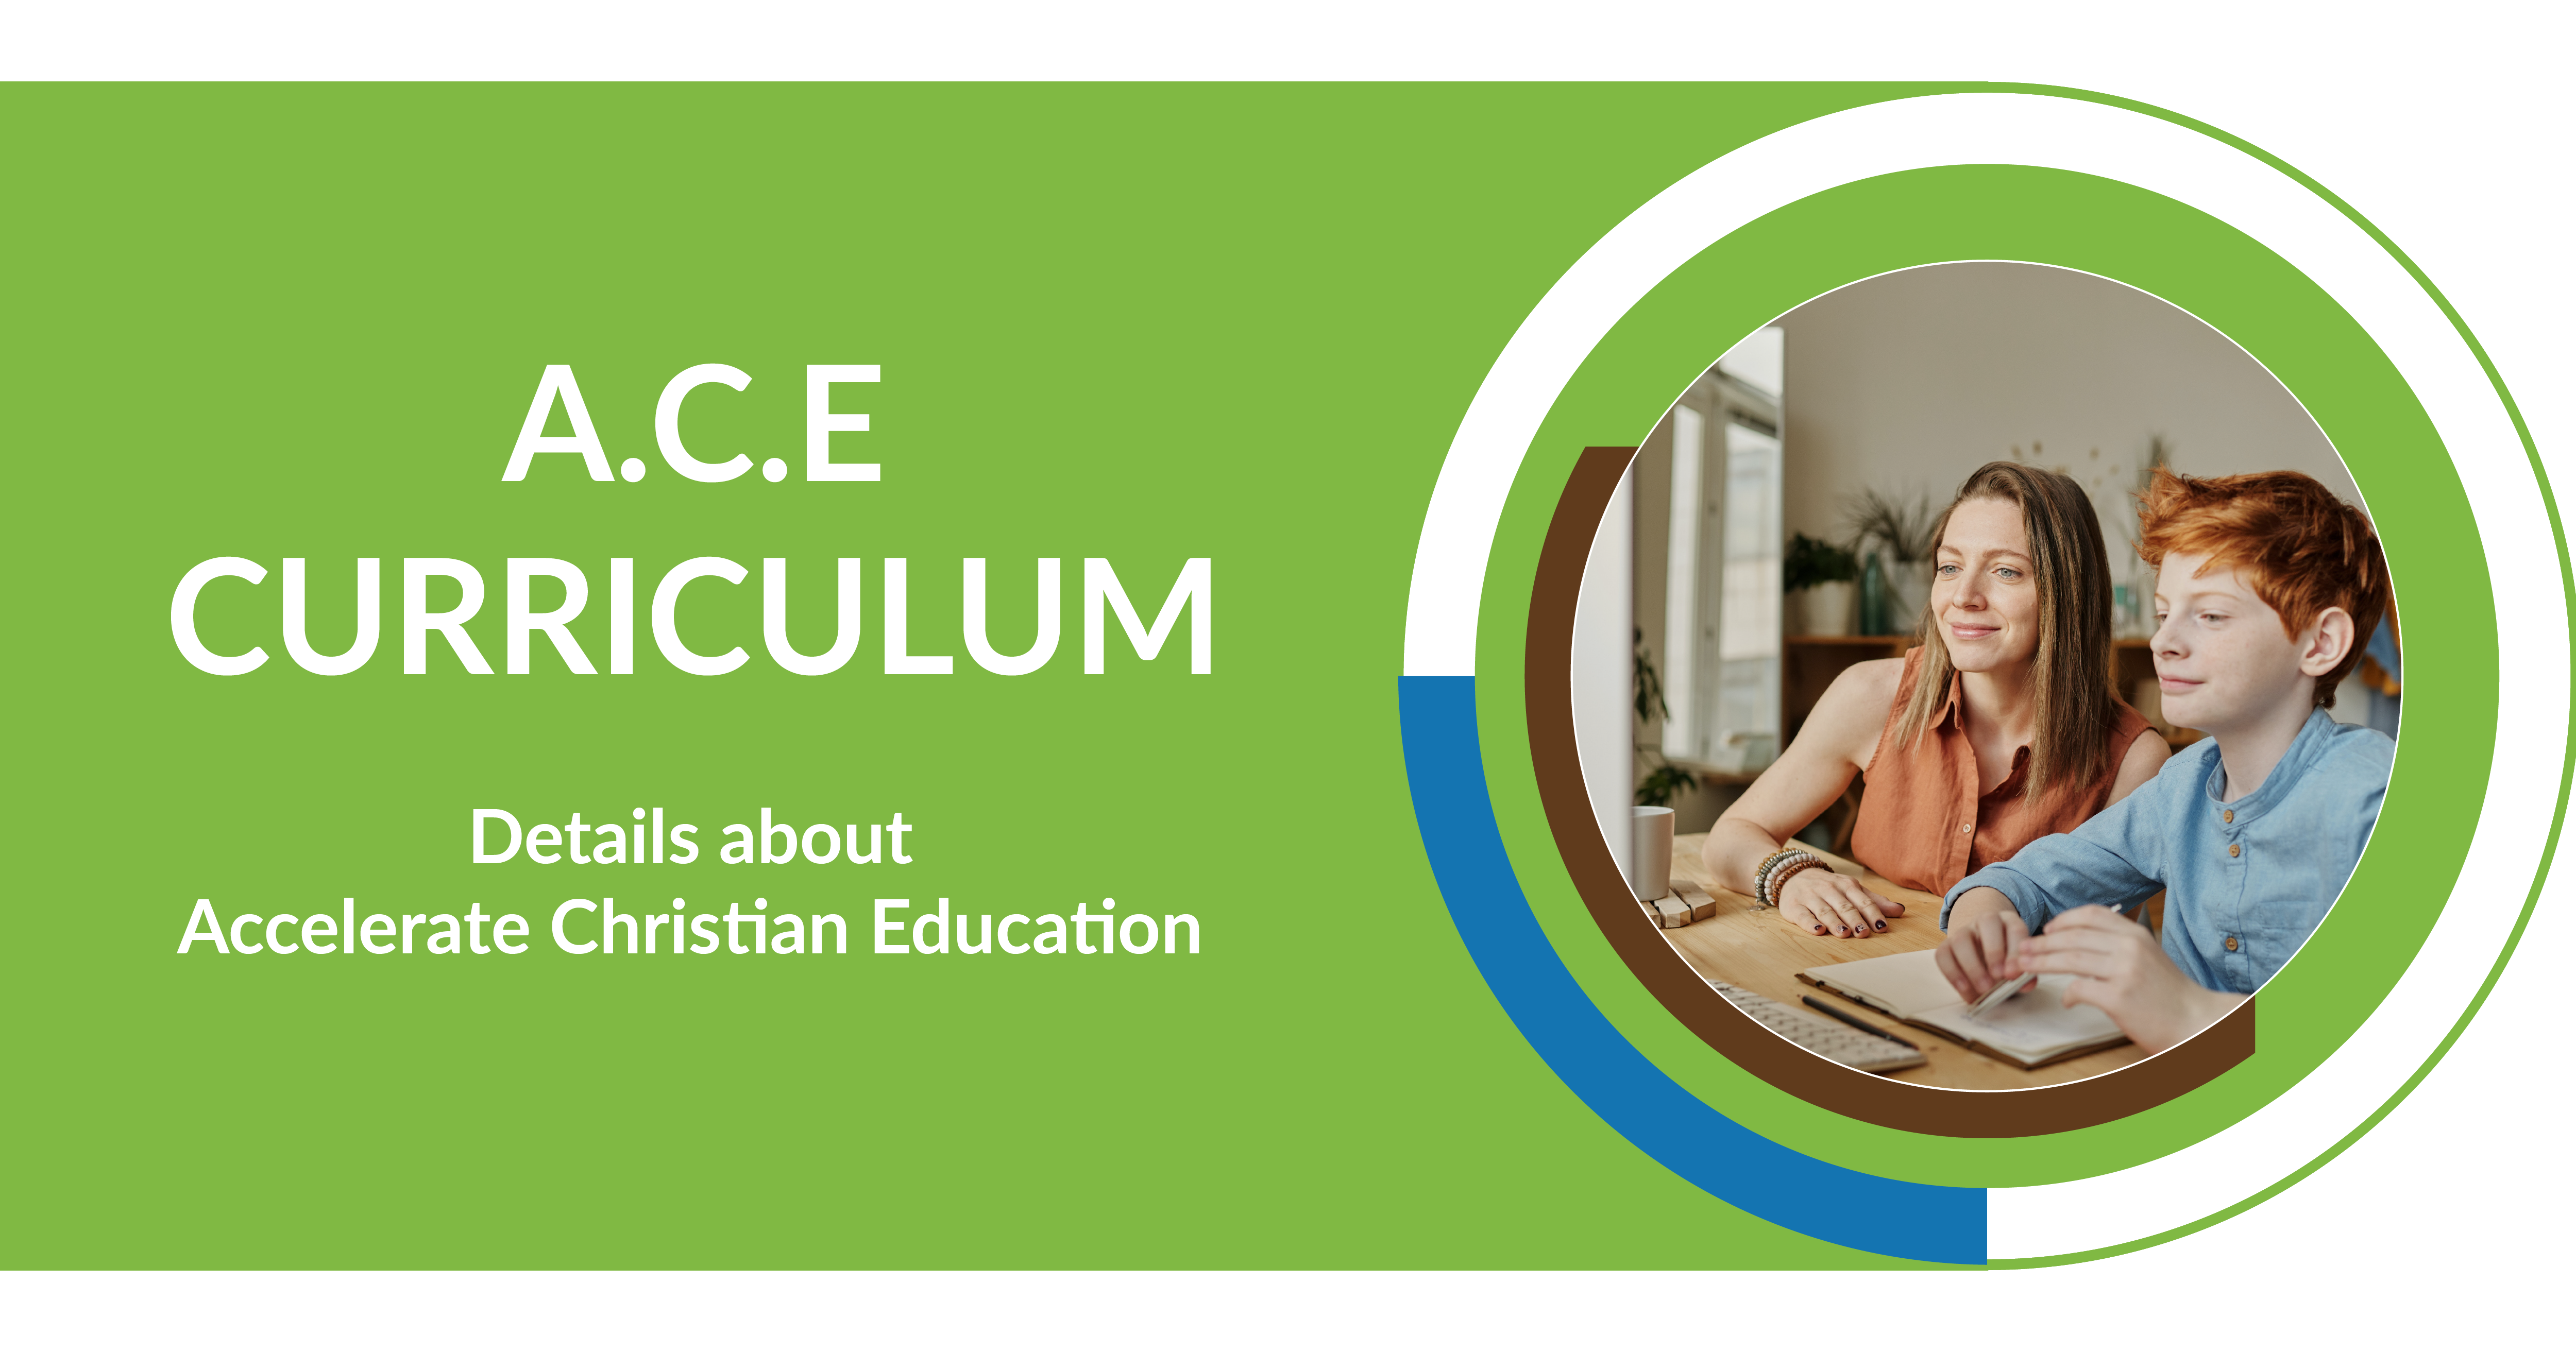 ACE HOMESCHOOLING, ACE Curriculum Details